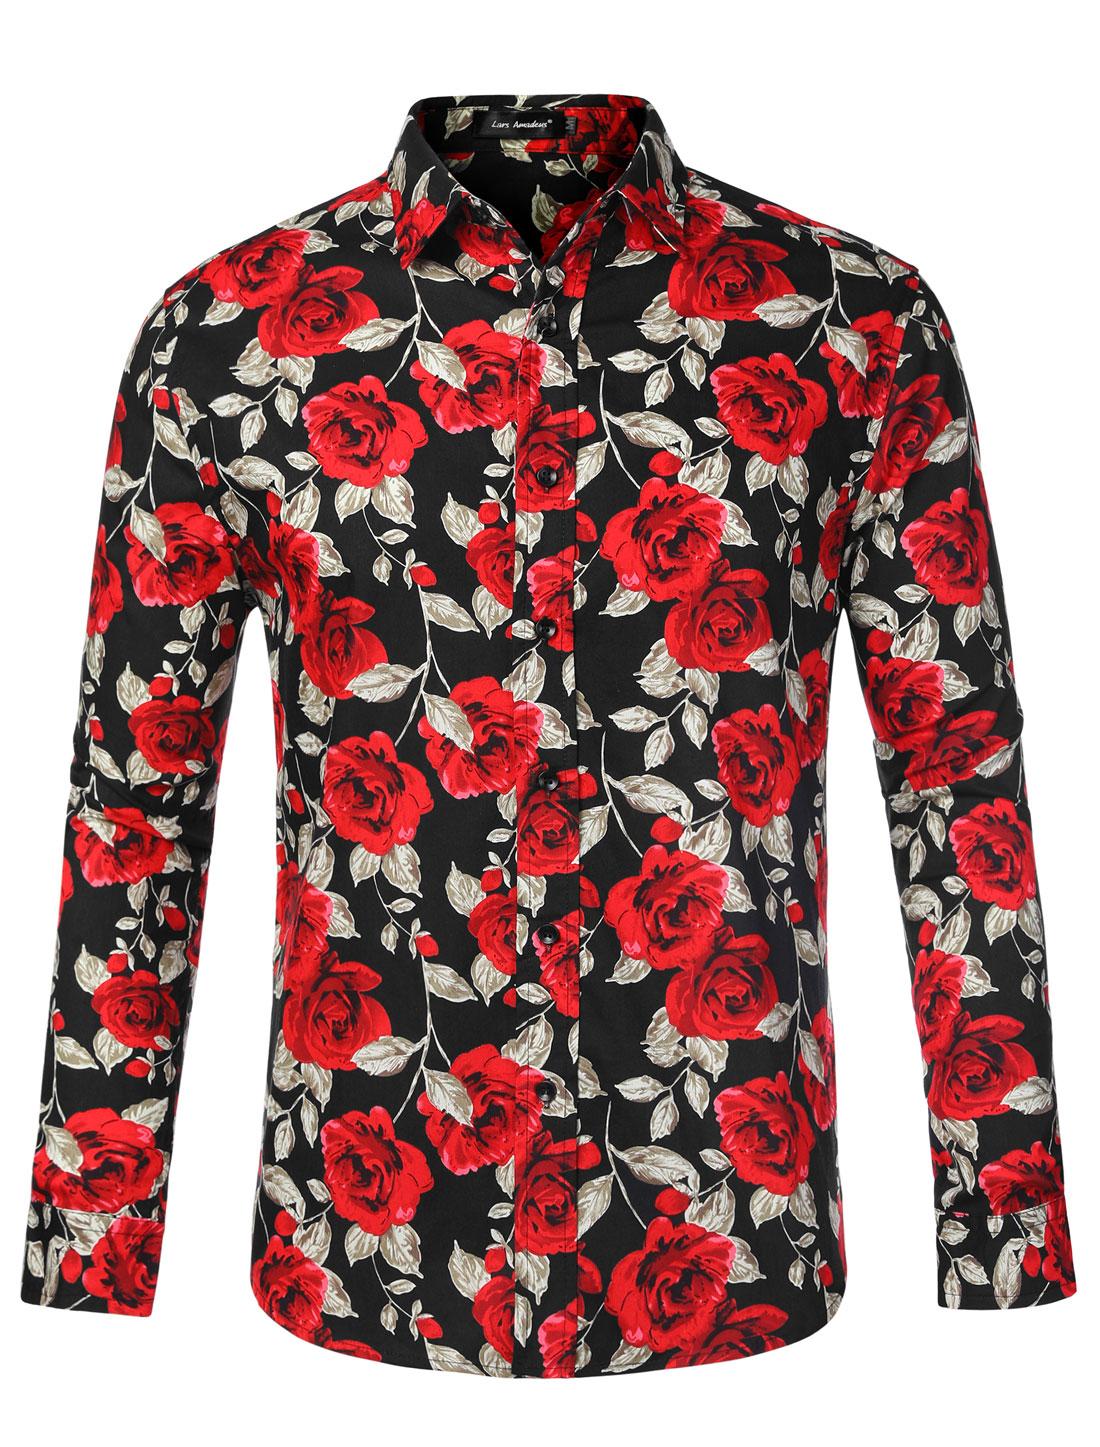 Men Floral Hawaiian Palm Flower Printed Shirt Black Rose XXL (US 50)